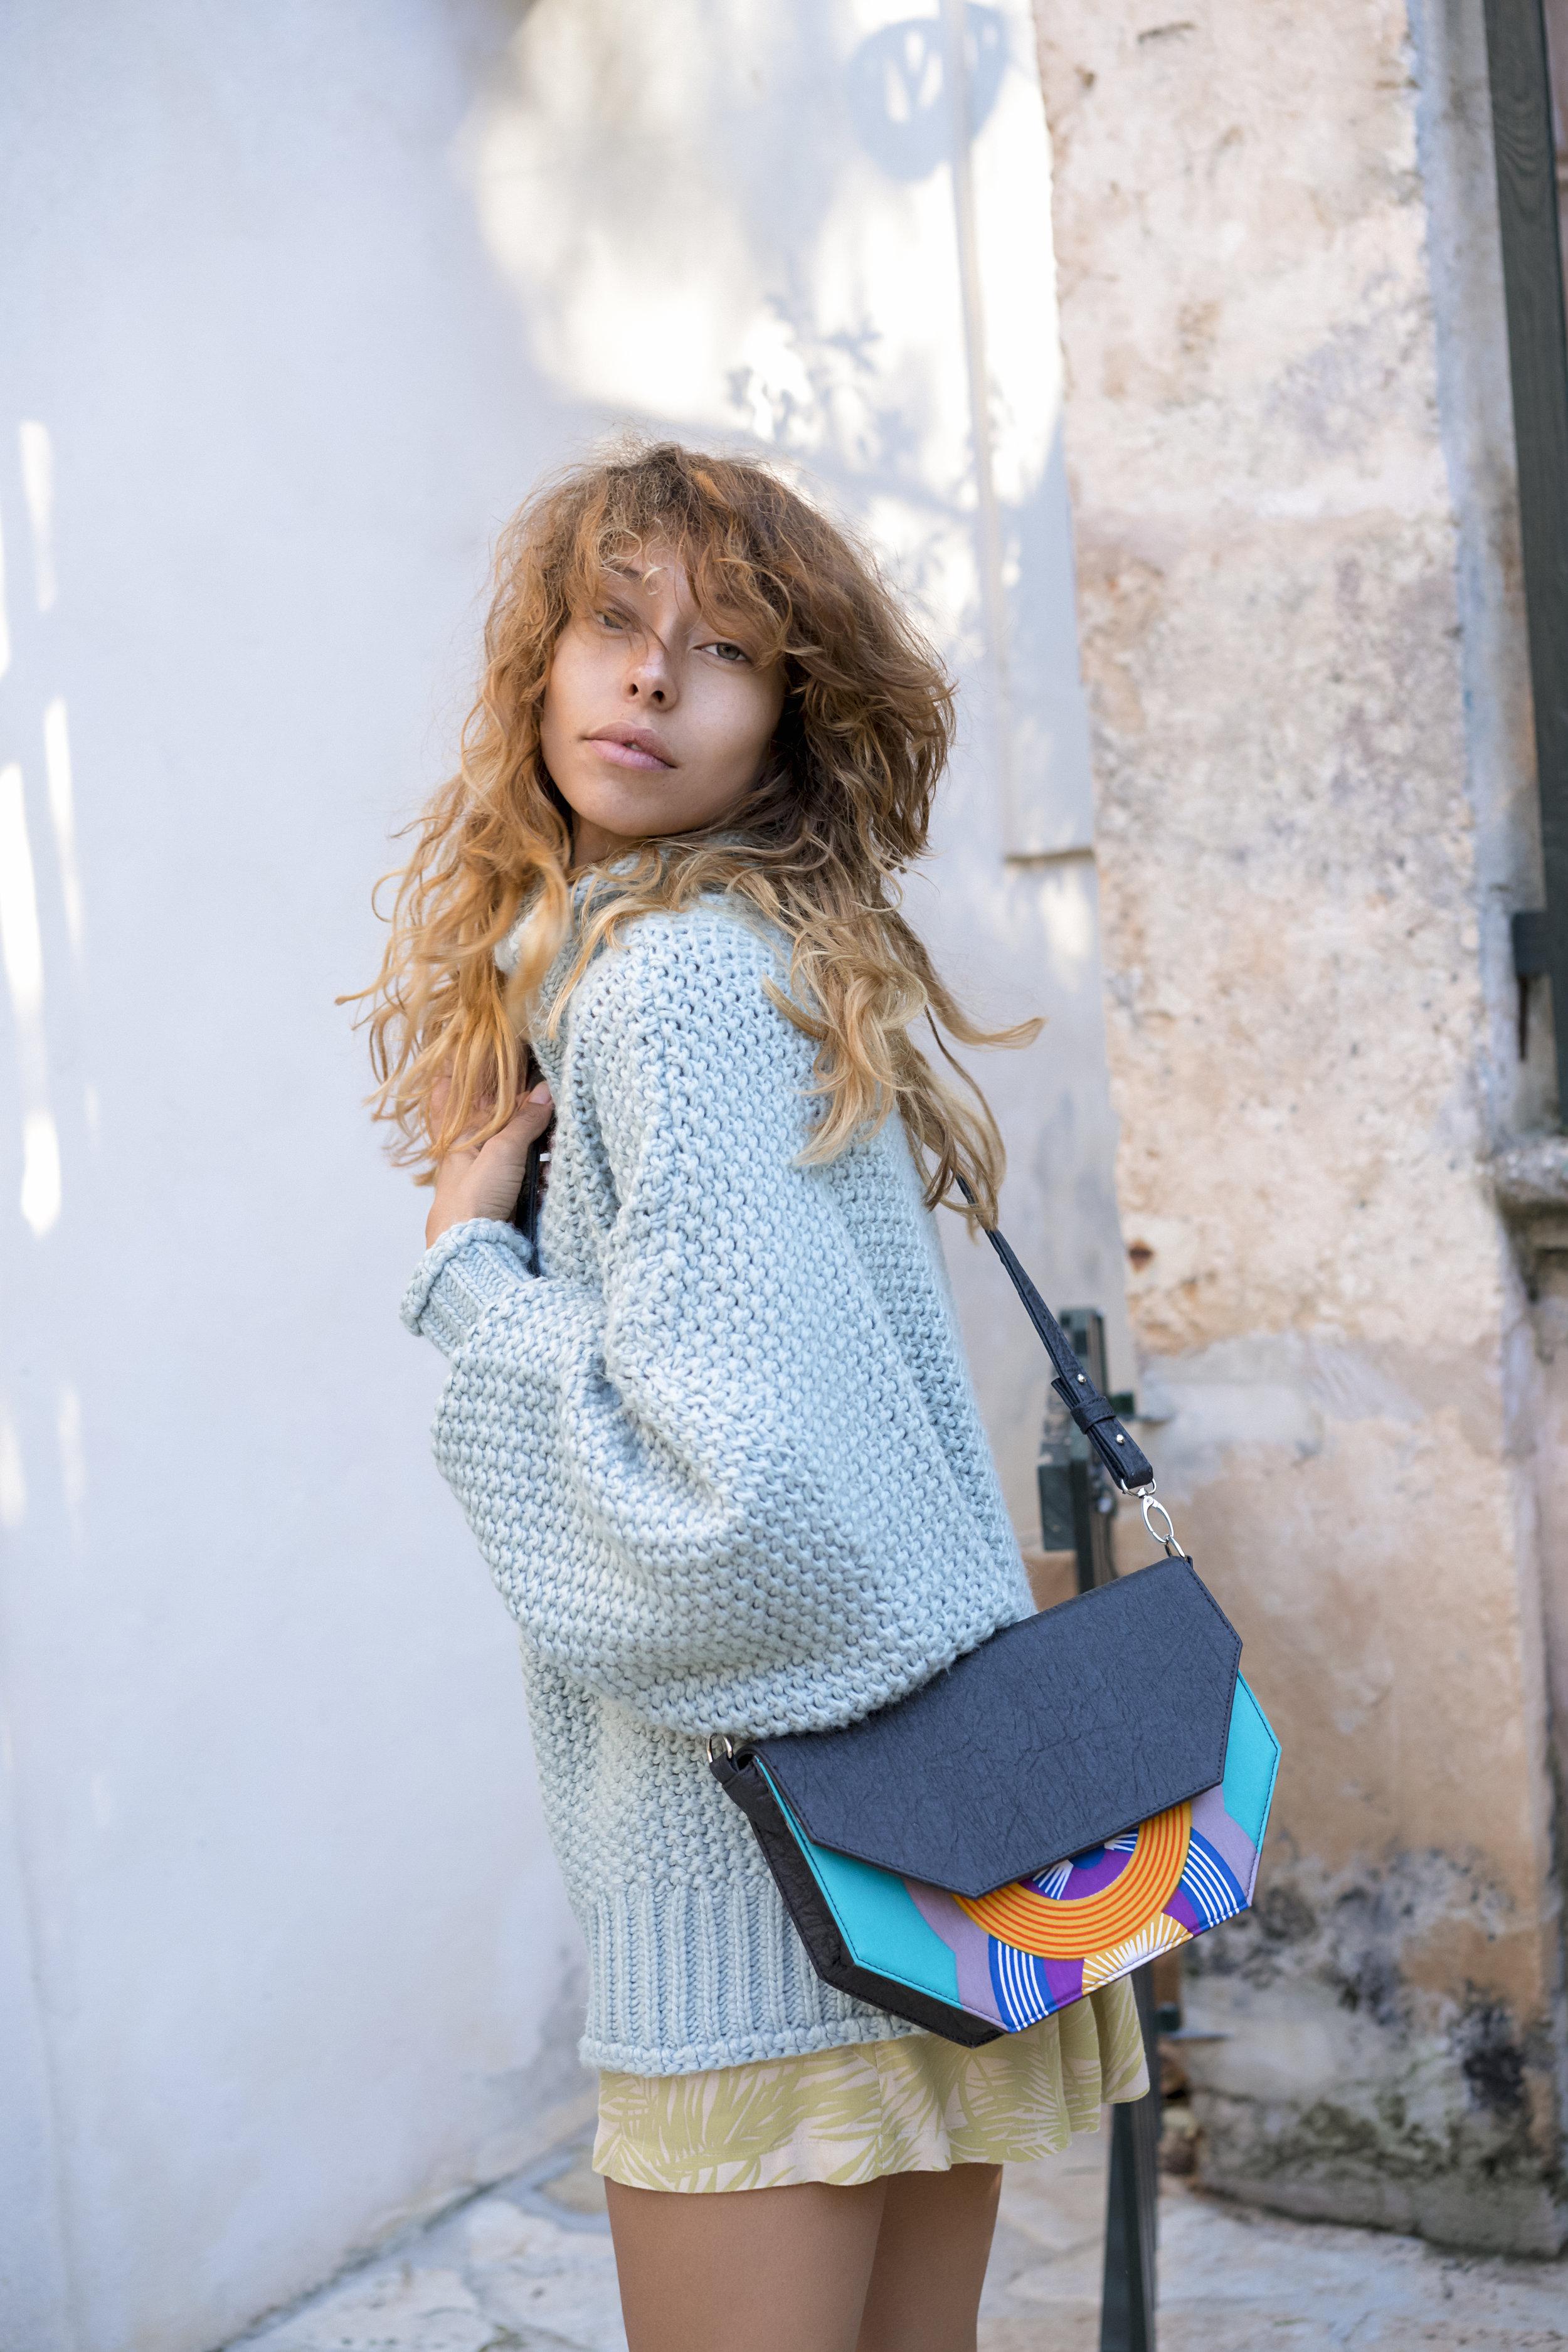 Maravillas Bags - The Mediterranean Lifestyle